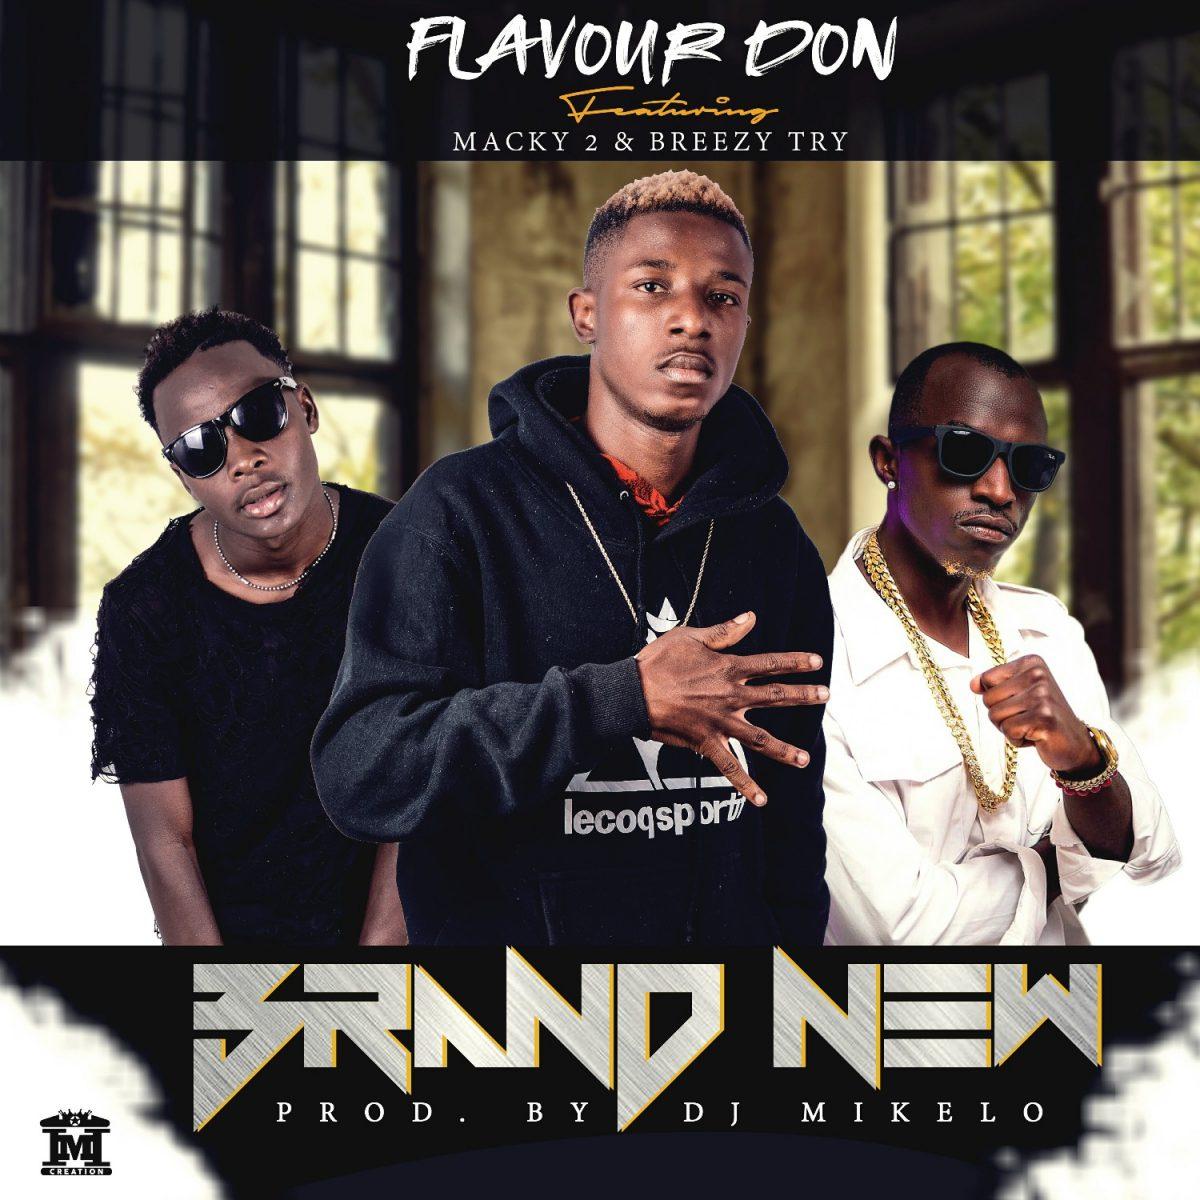 Flavour Don ft. Macky 2 & Breezy Trey - Brand New